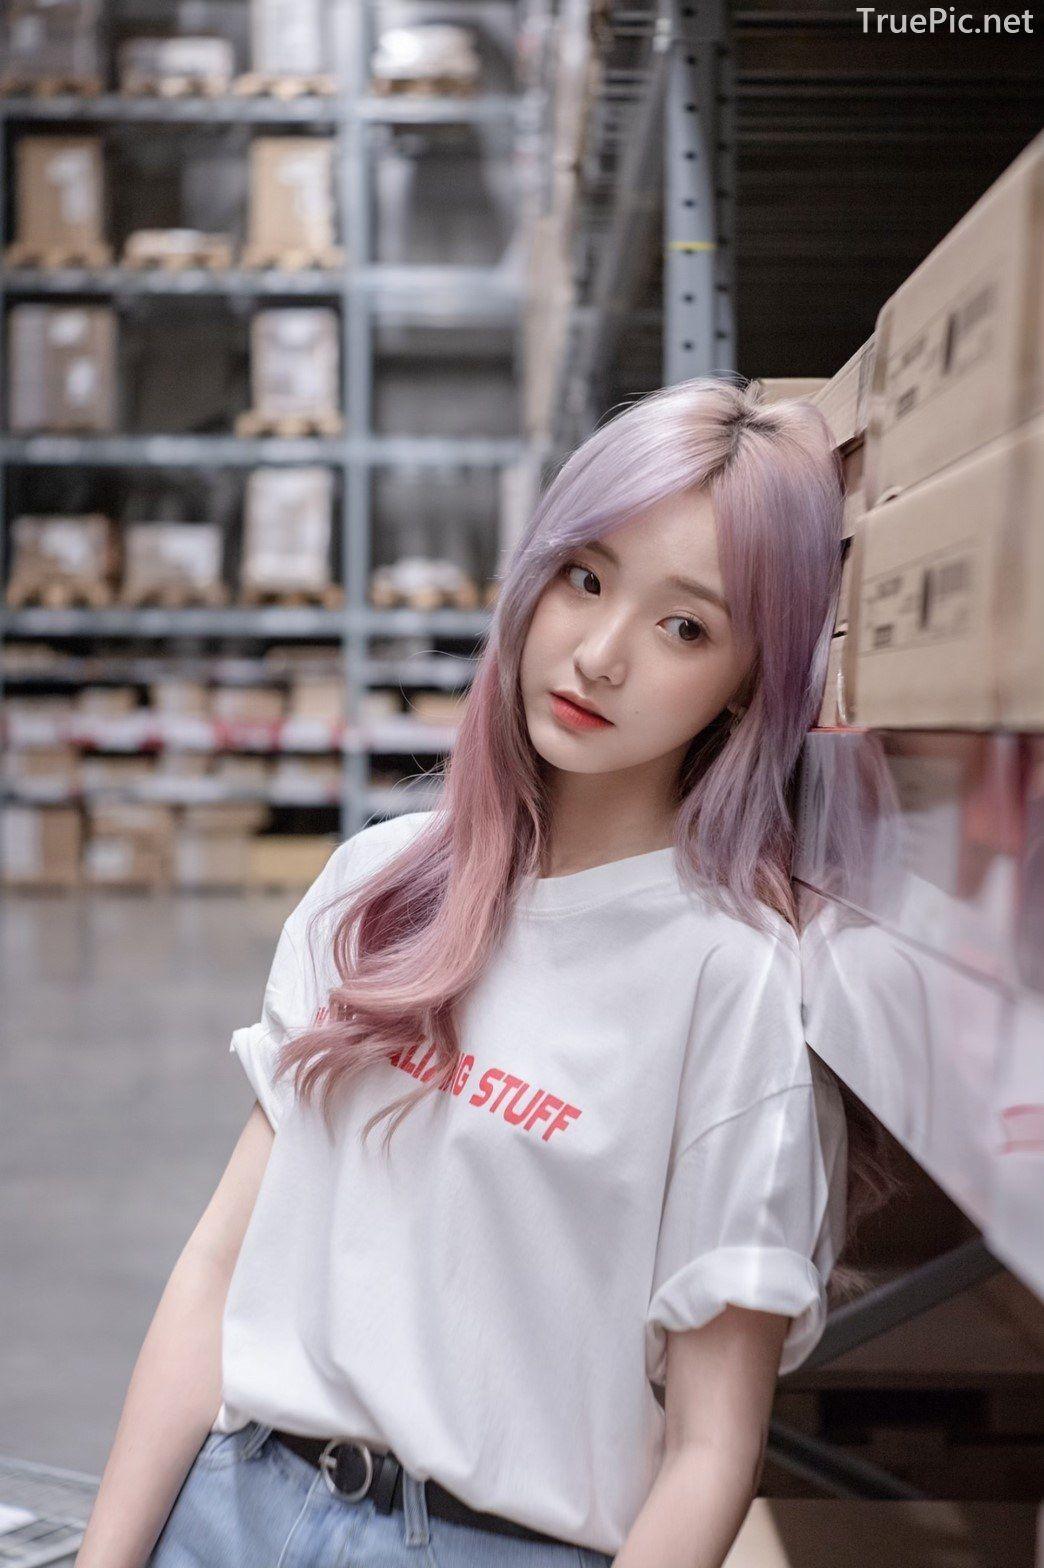 Thailand hot girl Pornnppan Pornpenpipat (Nenevader) - She is the dream lover of many boys